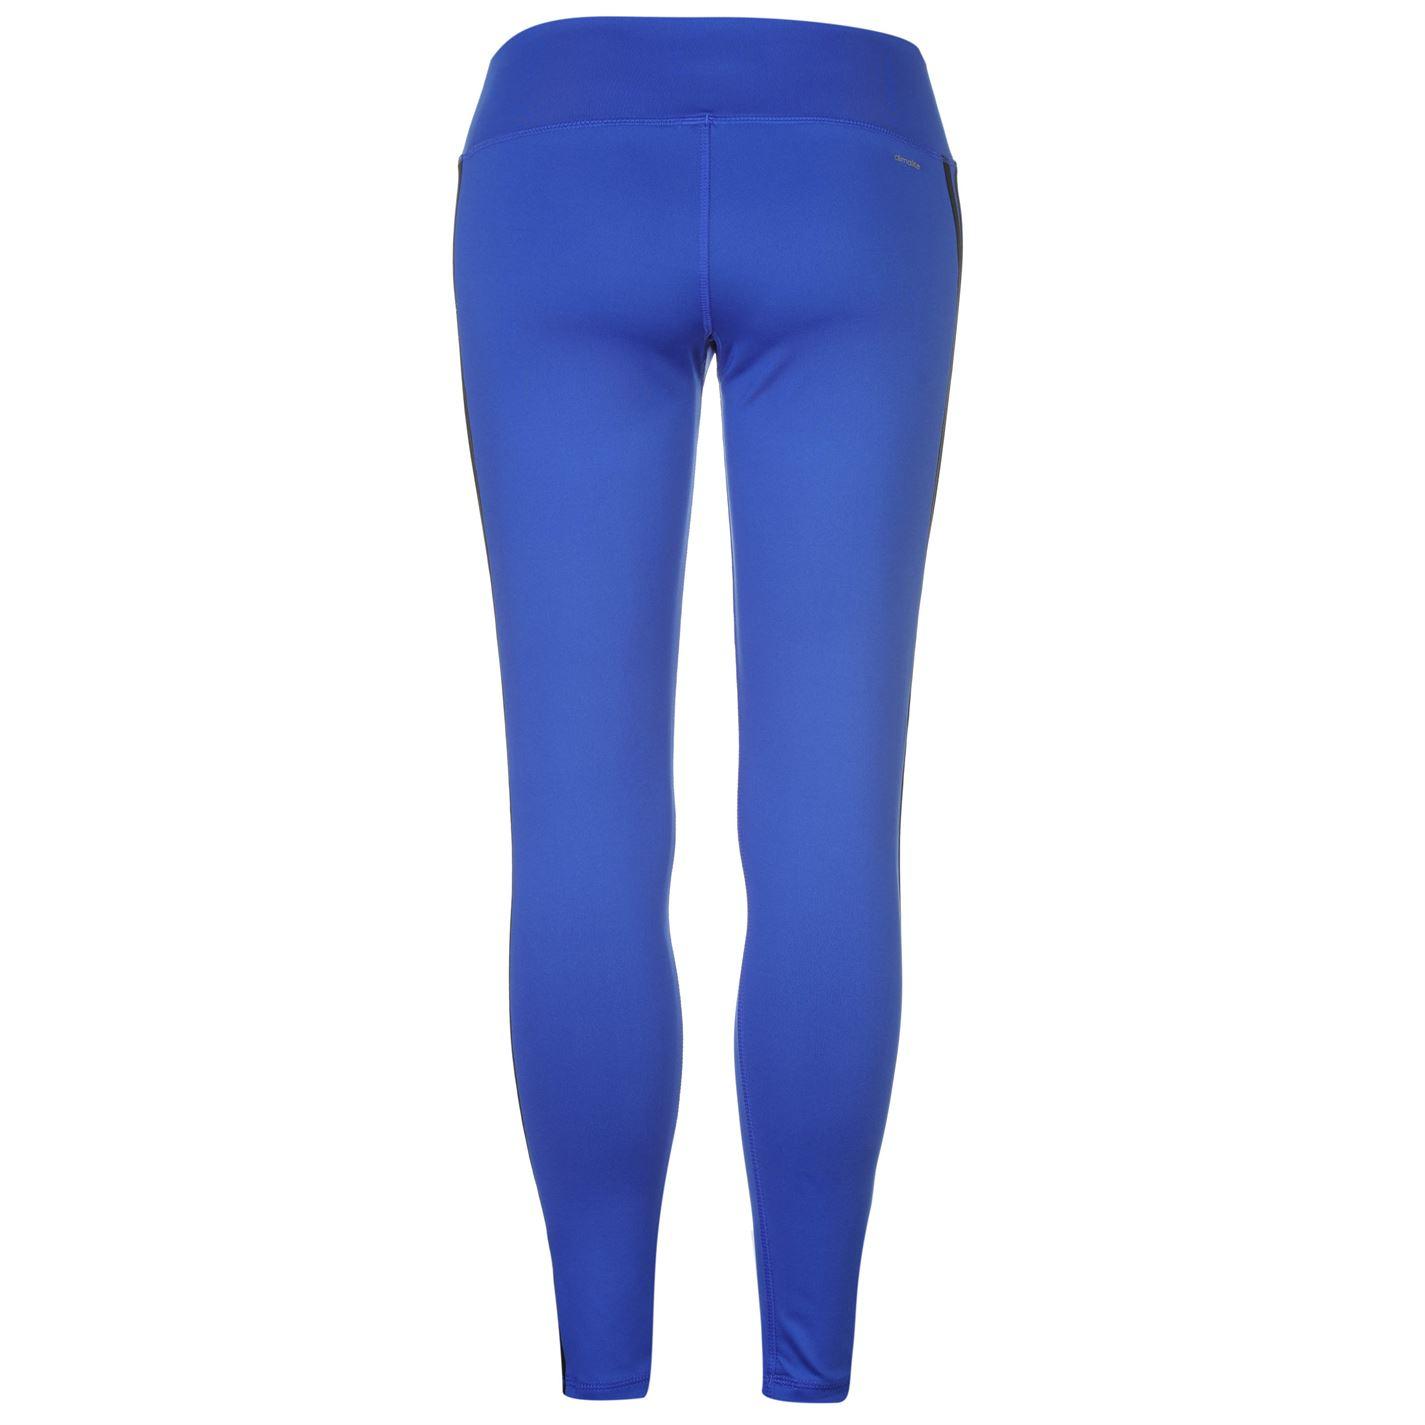 adidas Womens 3S Long Tight Ladies Elastic Sports Pants Training ... 0f9a20af43